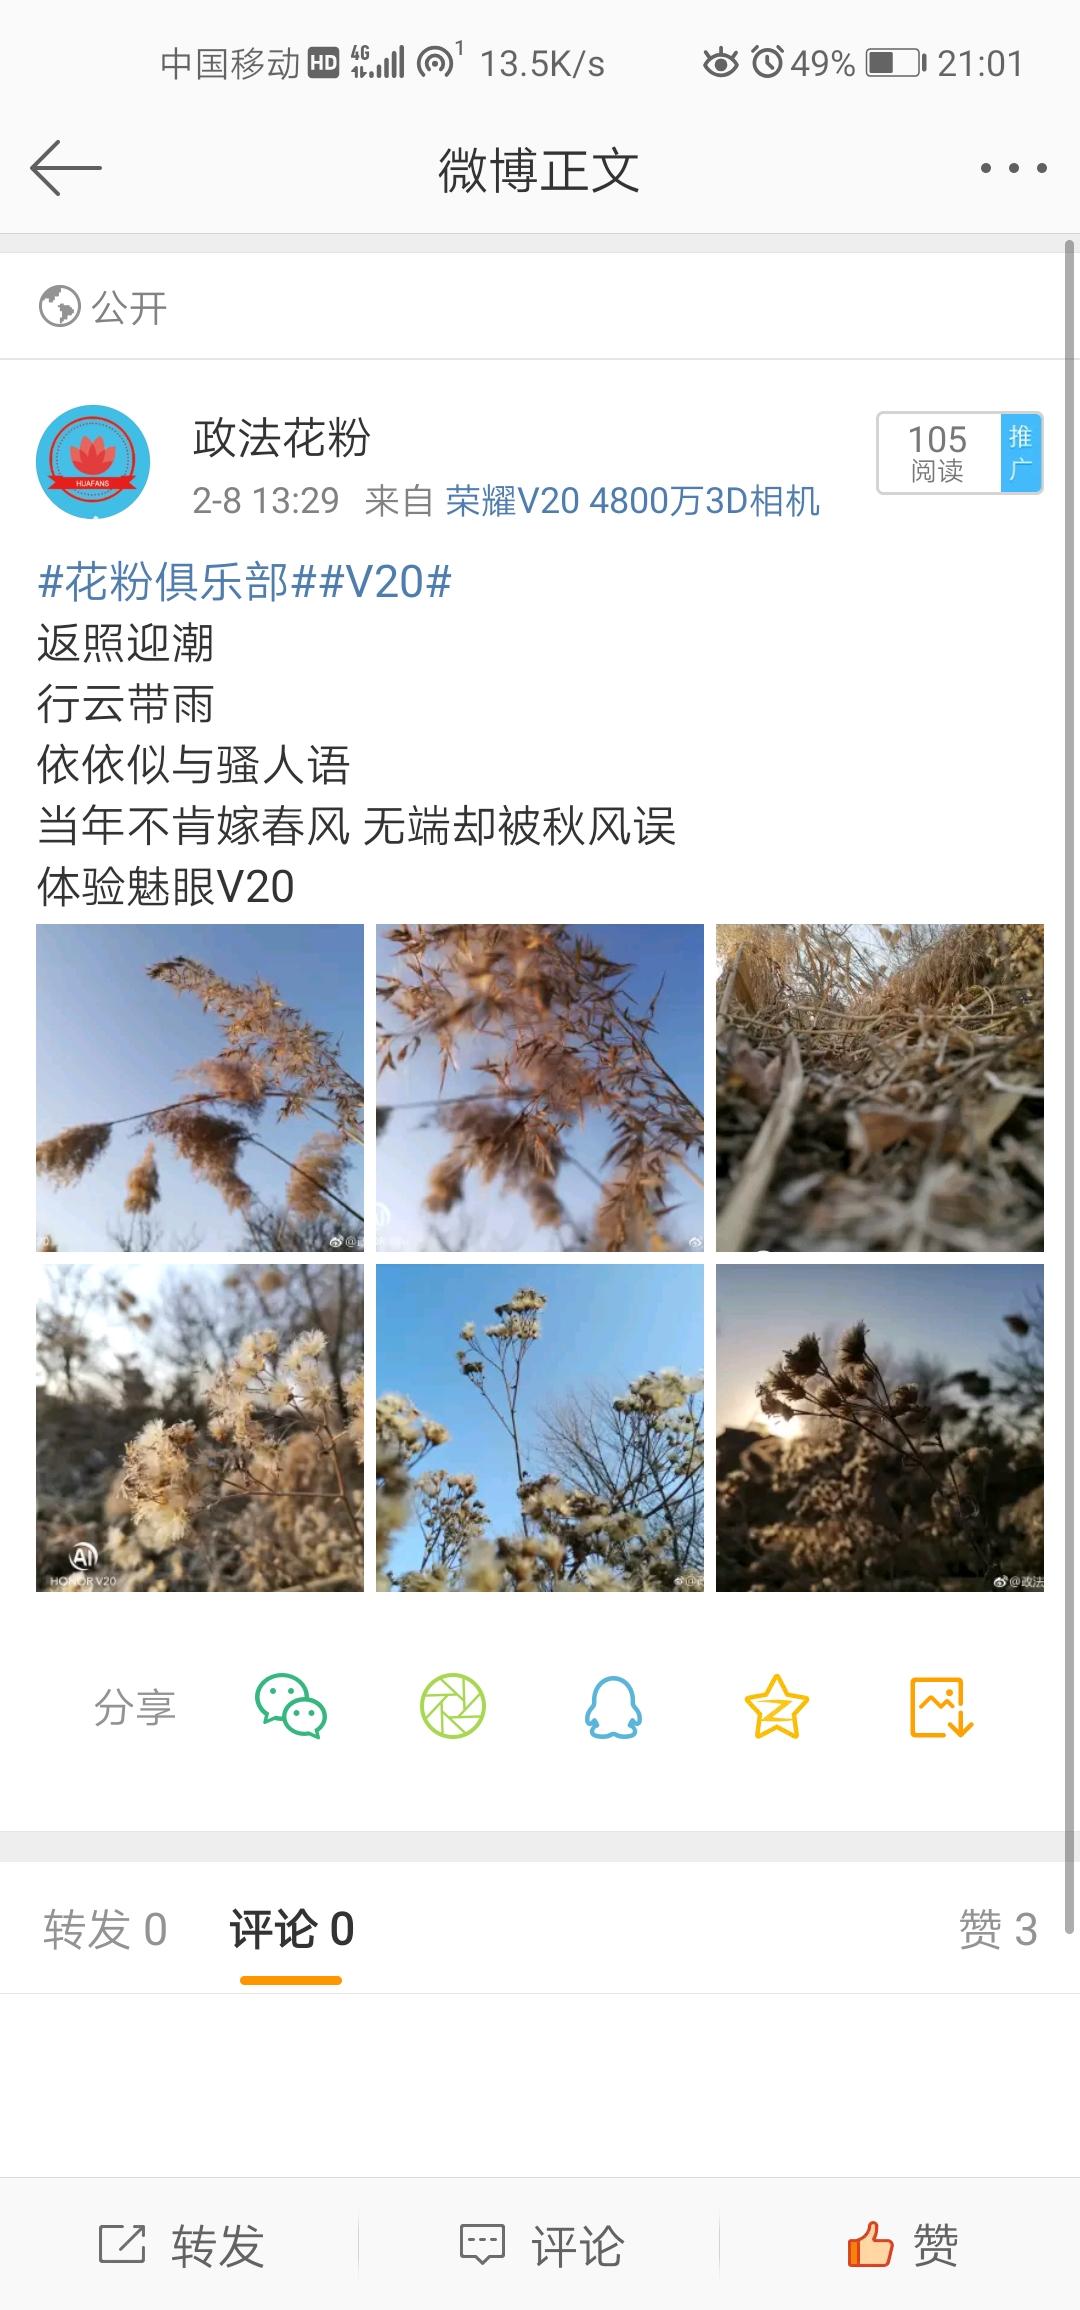 Screenshot_20190210_210107_com.sina.weibo.jpg